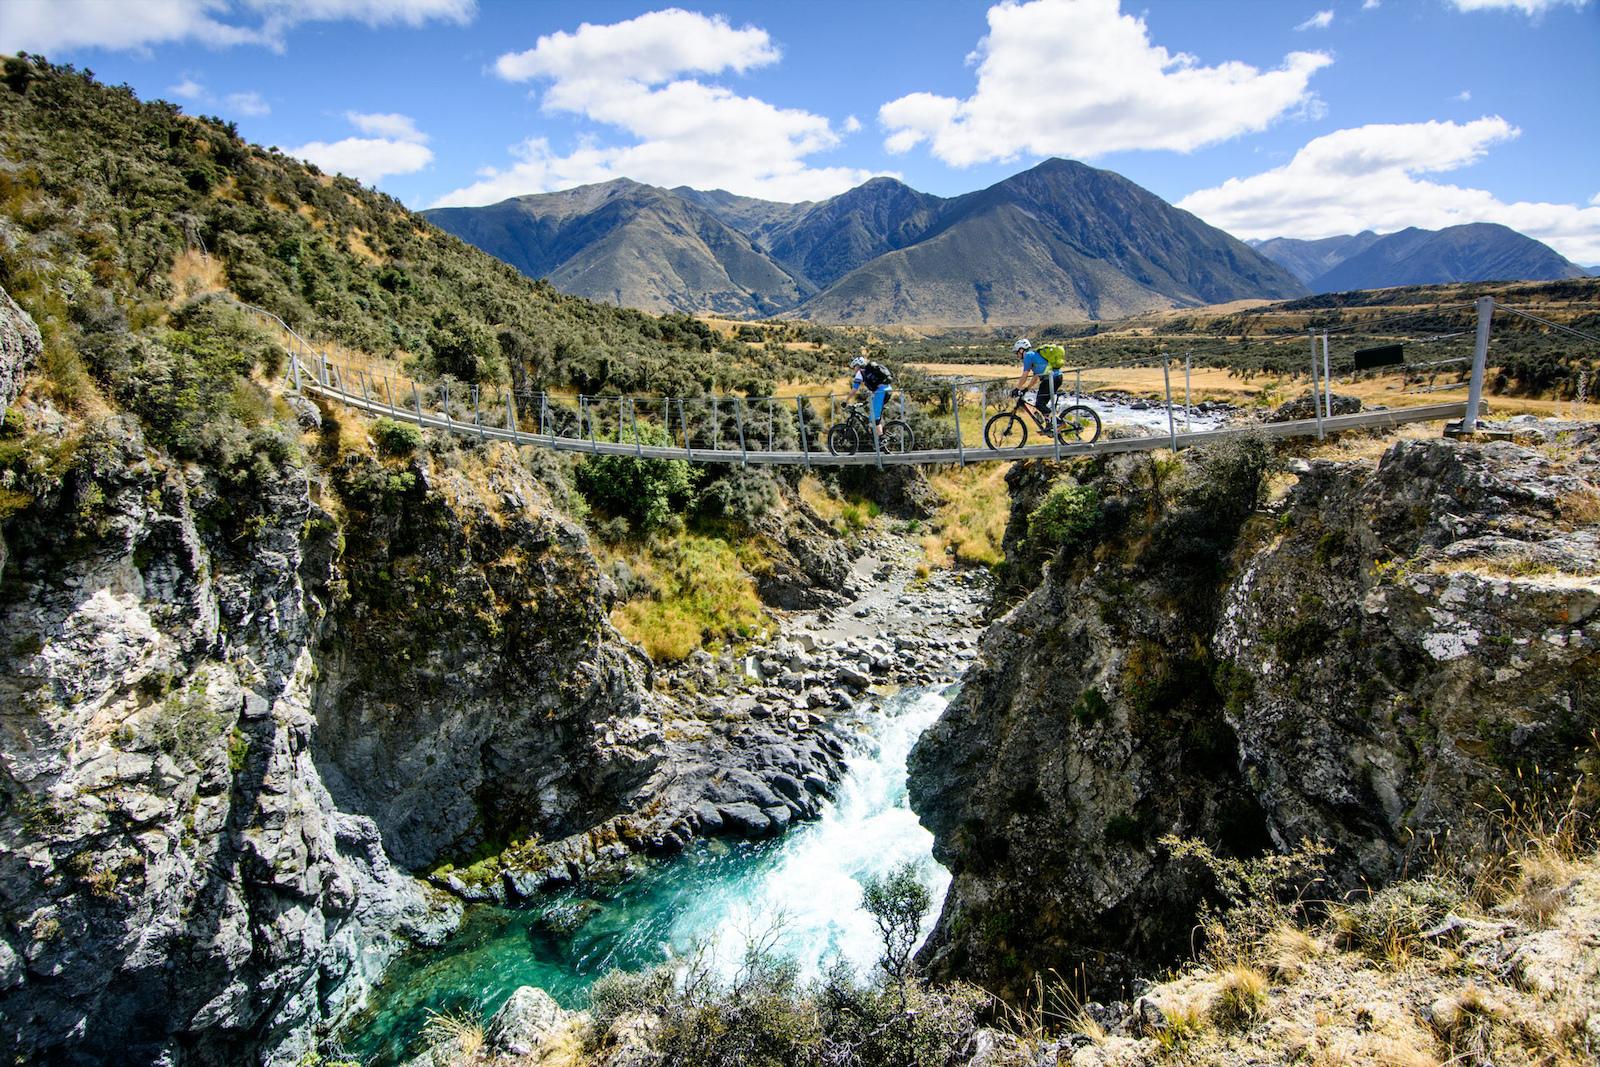 Backcountry biking through vast landscapes of St. James, New Zealand